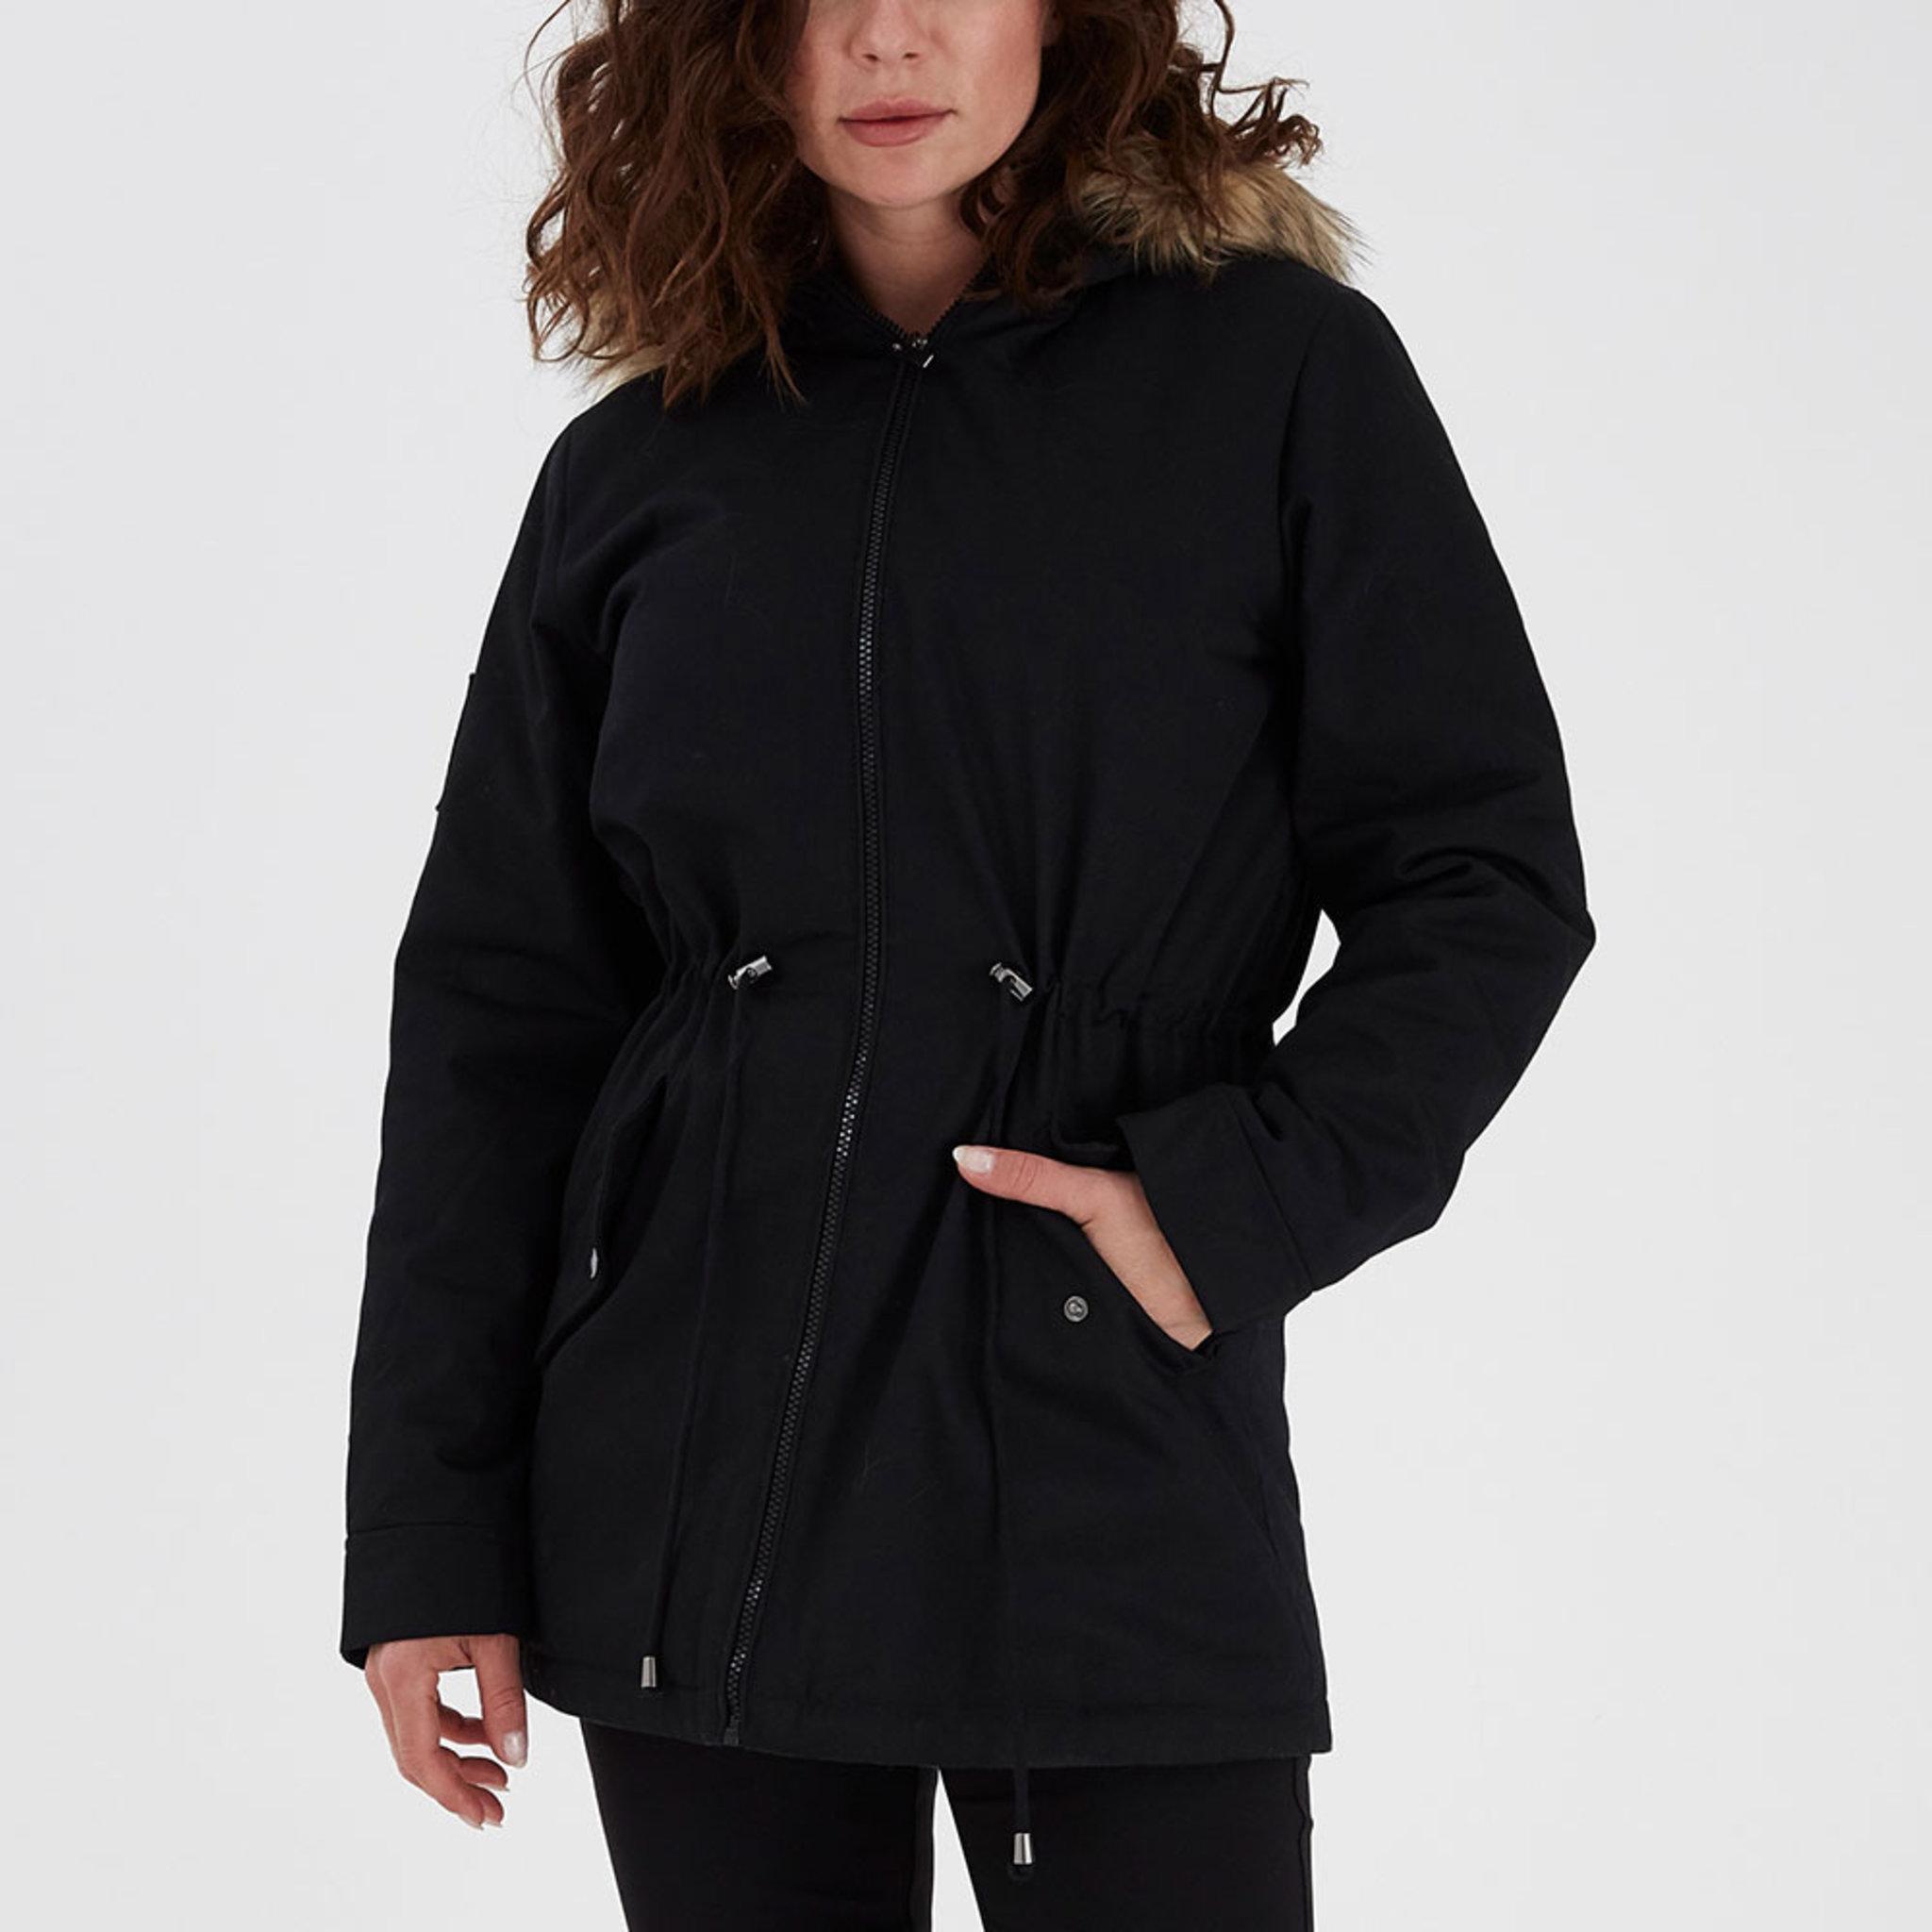 FRLASUM 1 Outerwear